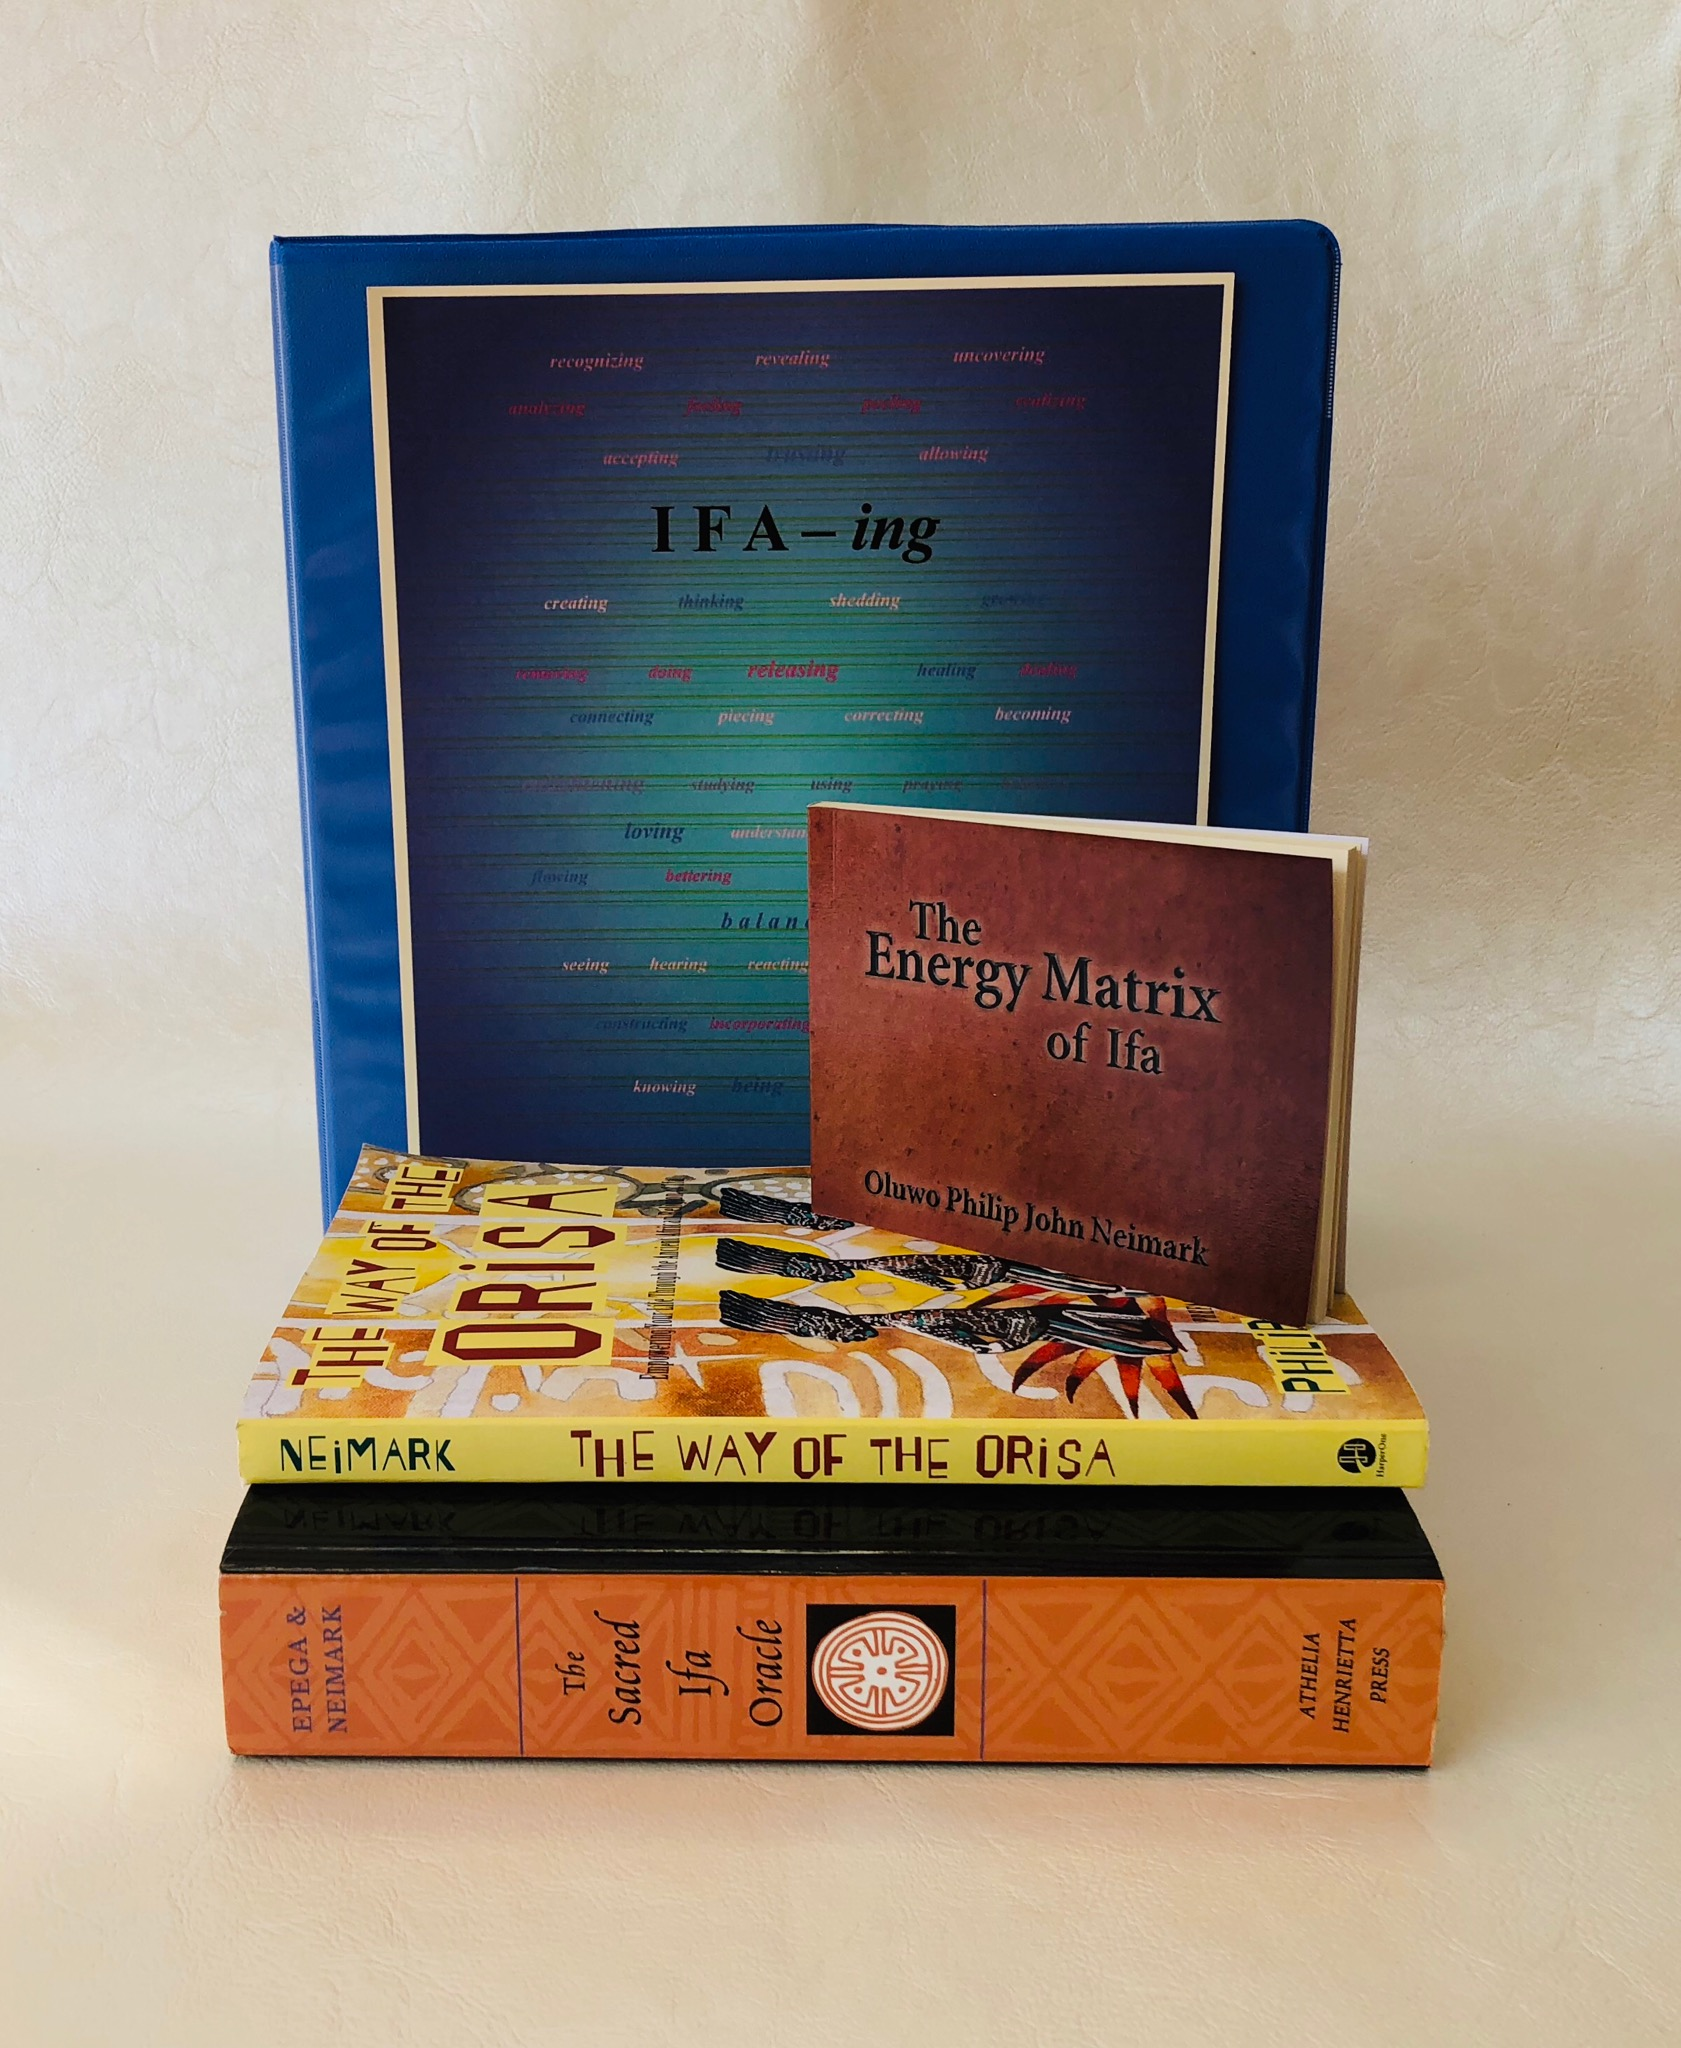 Books, CD, DVD,MP3